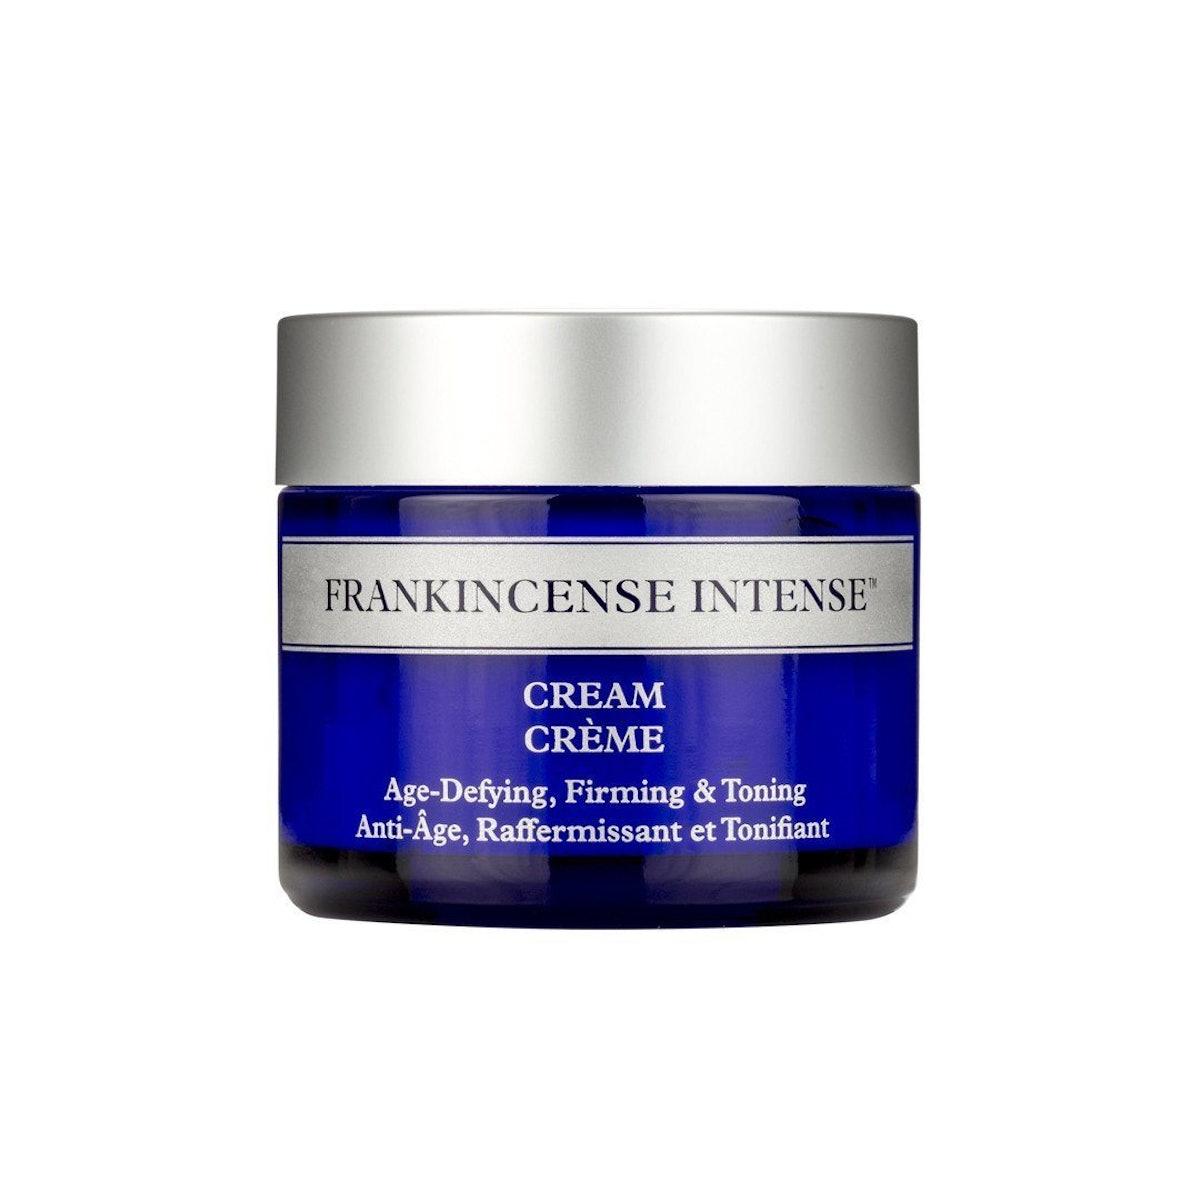 Frankincense Intense Cream